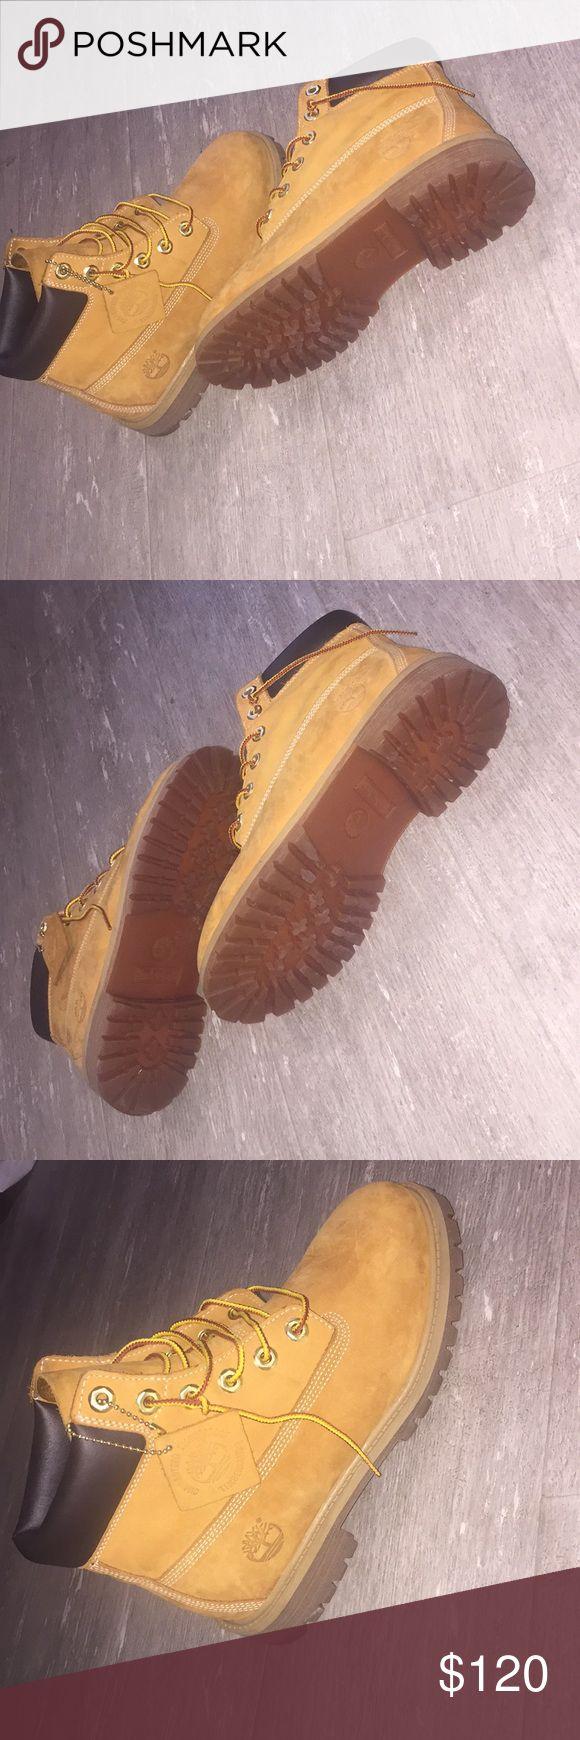 Timberland Boots Wheat Timberland Boots, Waterproof, Brand New Timberland Shoes Winter & Rain Boots